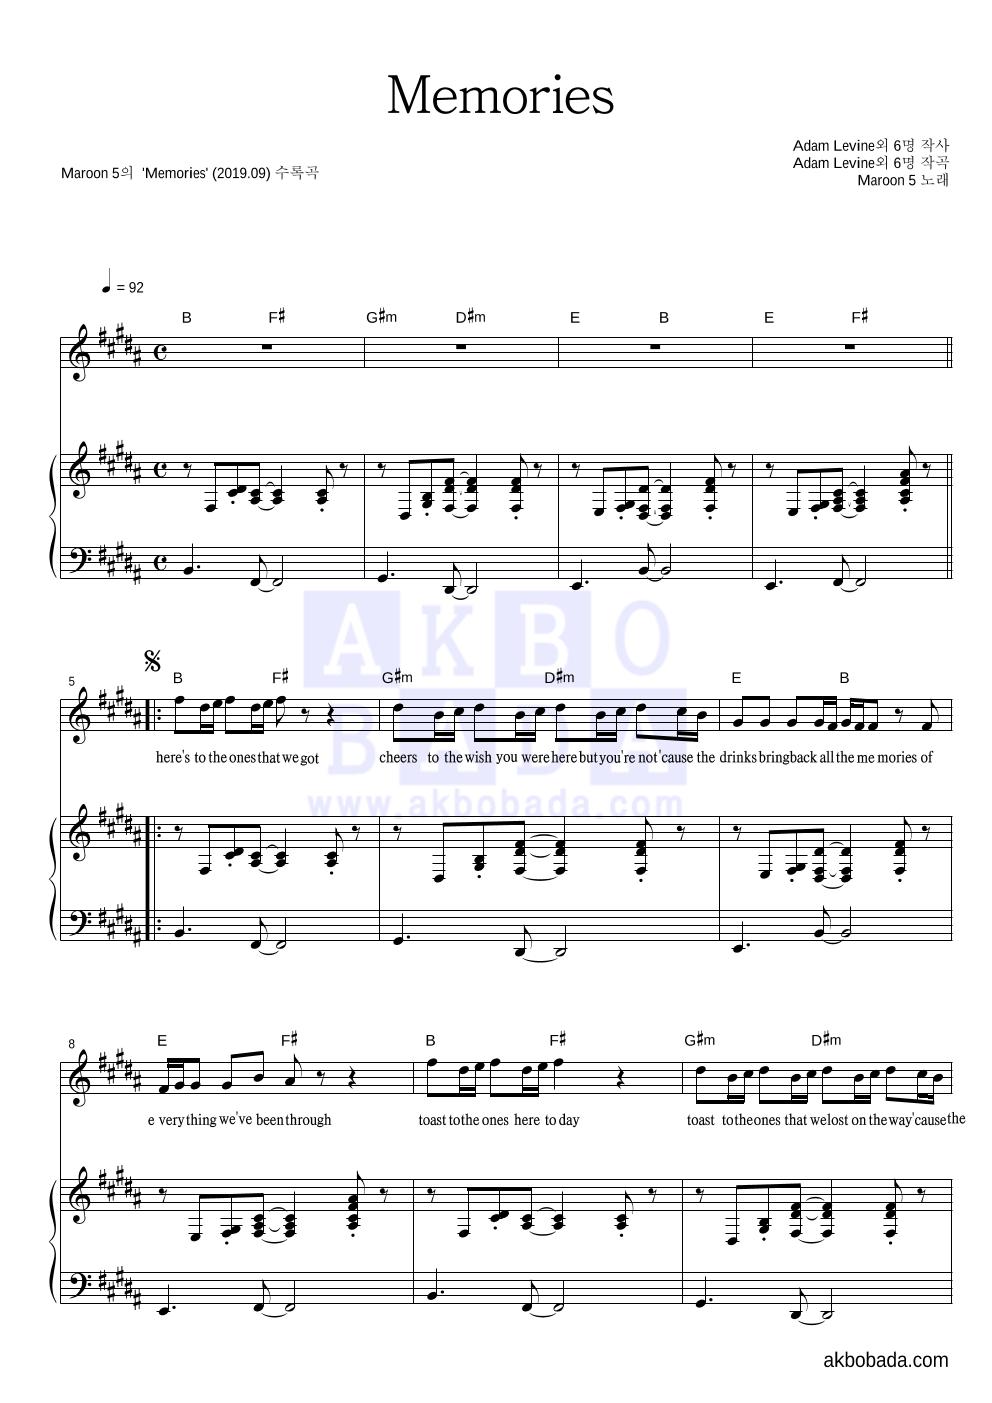 Maroon5 - Memories 피아노 3단 악보